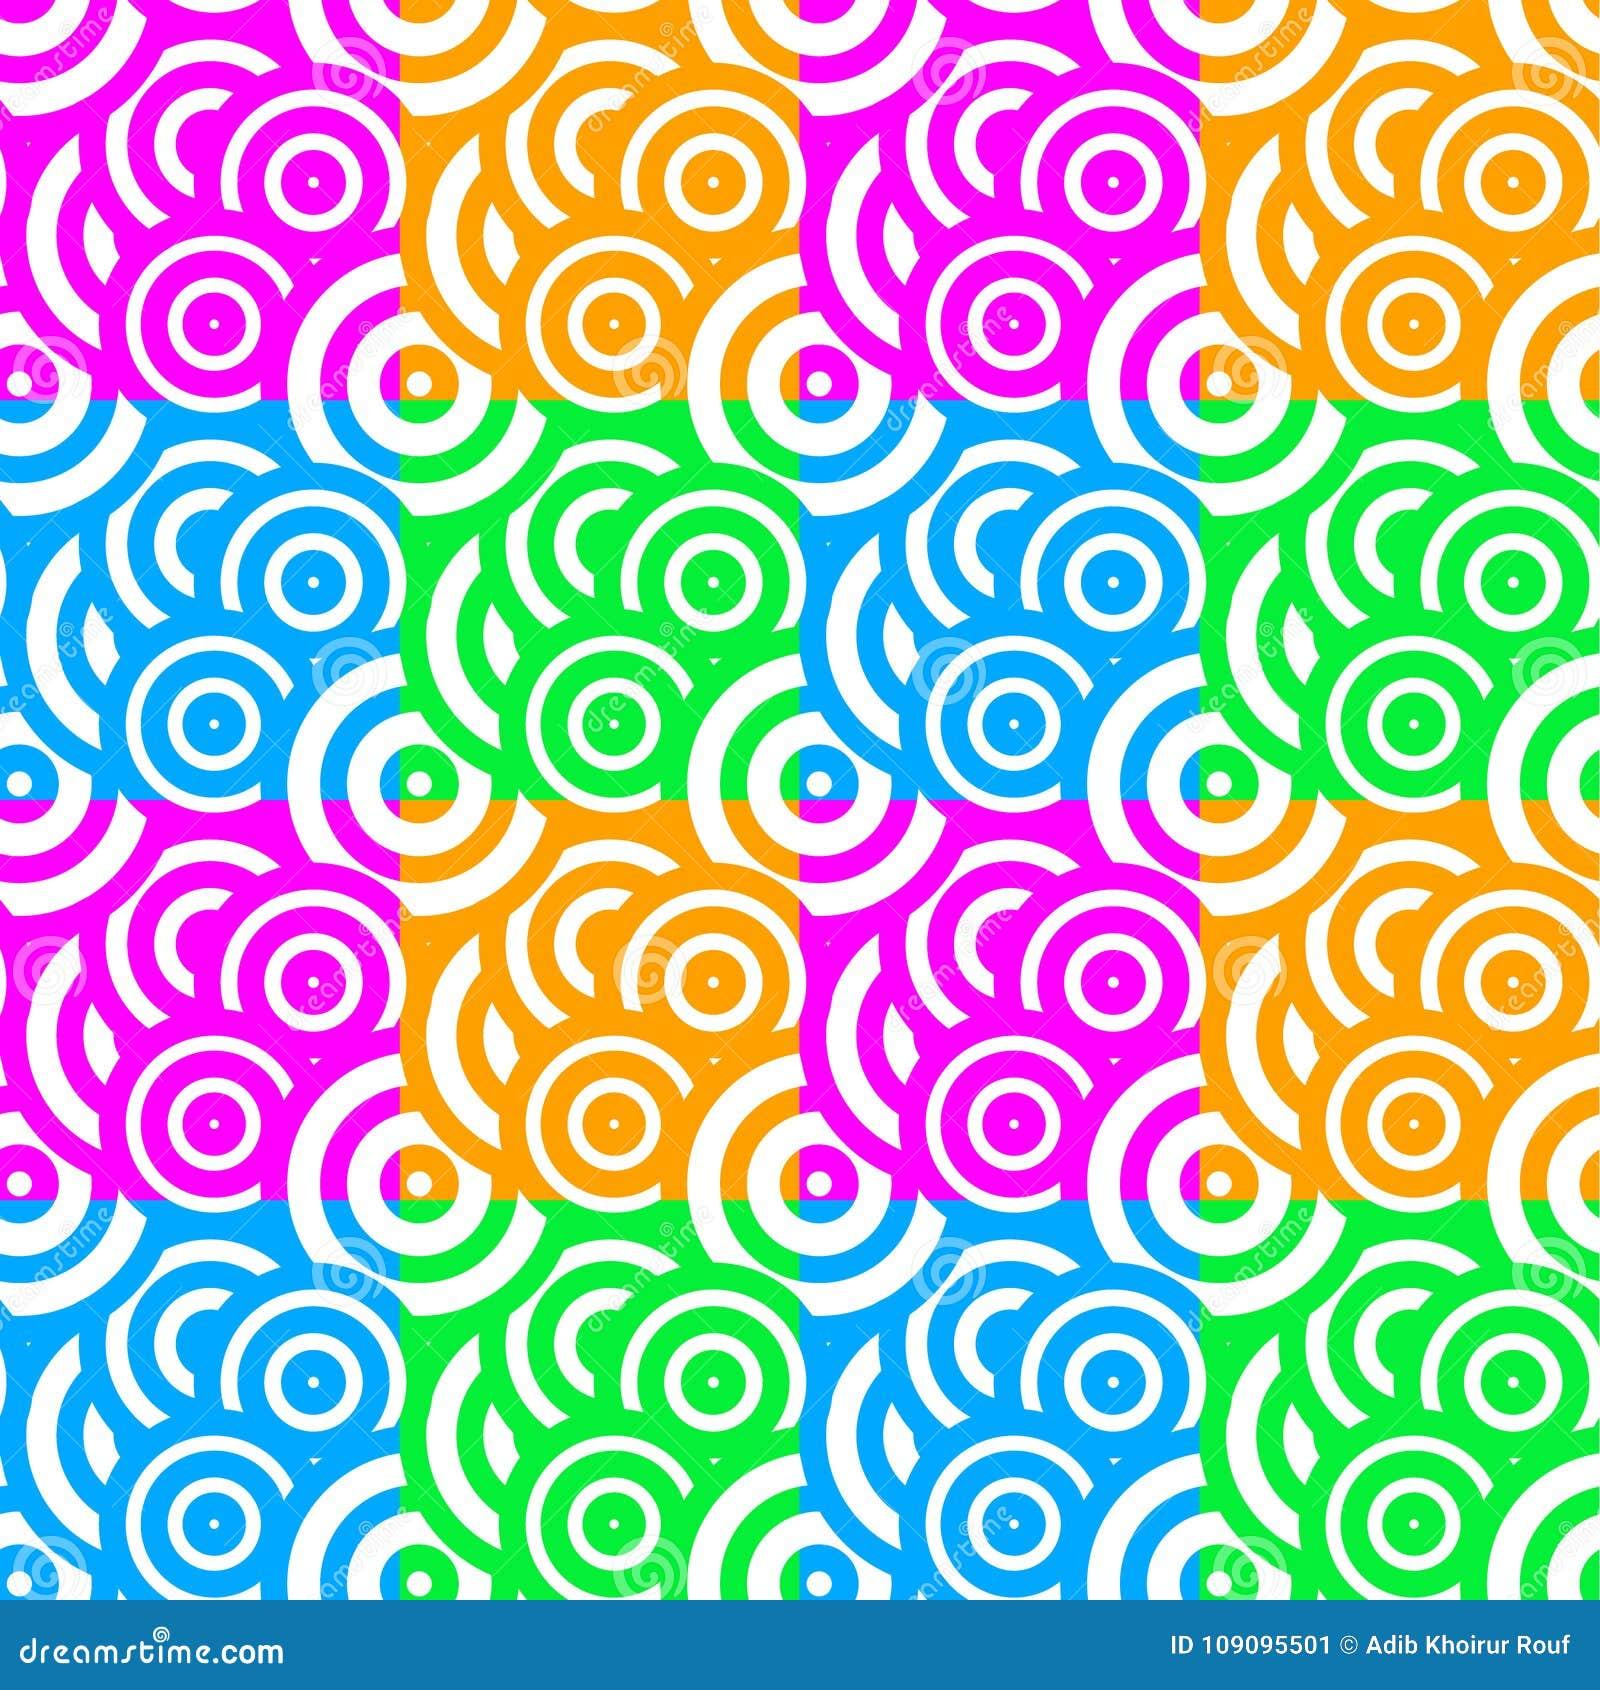 Rainbow Color Circle Pattern Seamless